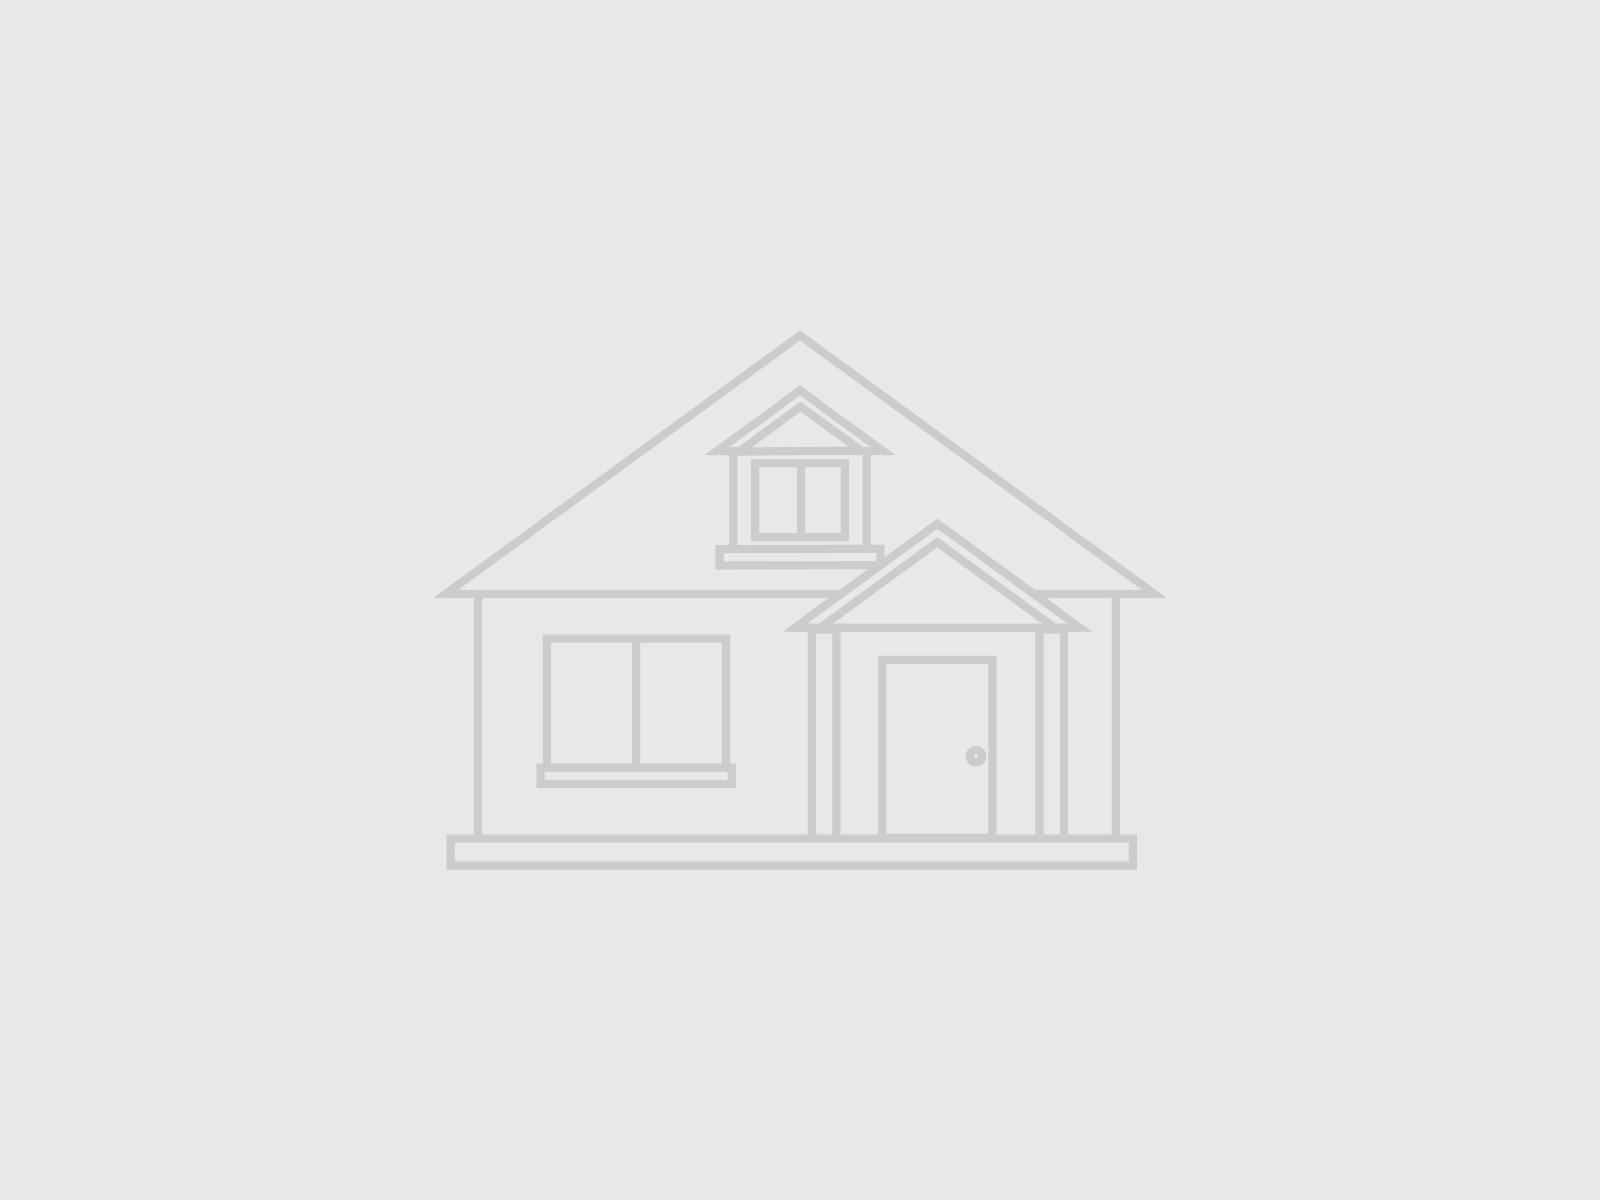 222 poplar lane a luxury single family home for sale in guffey, colorado property id 5400558 christie s international real estate